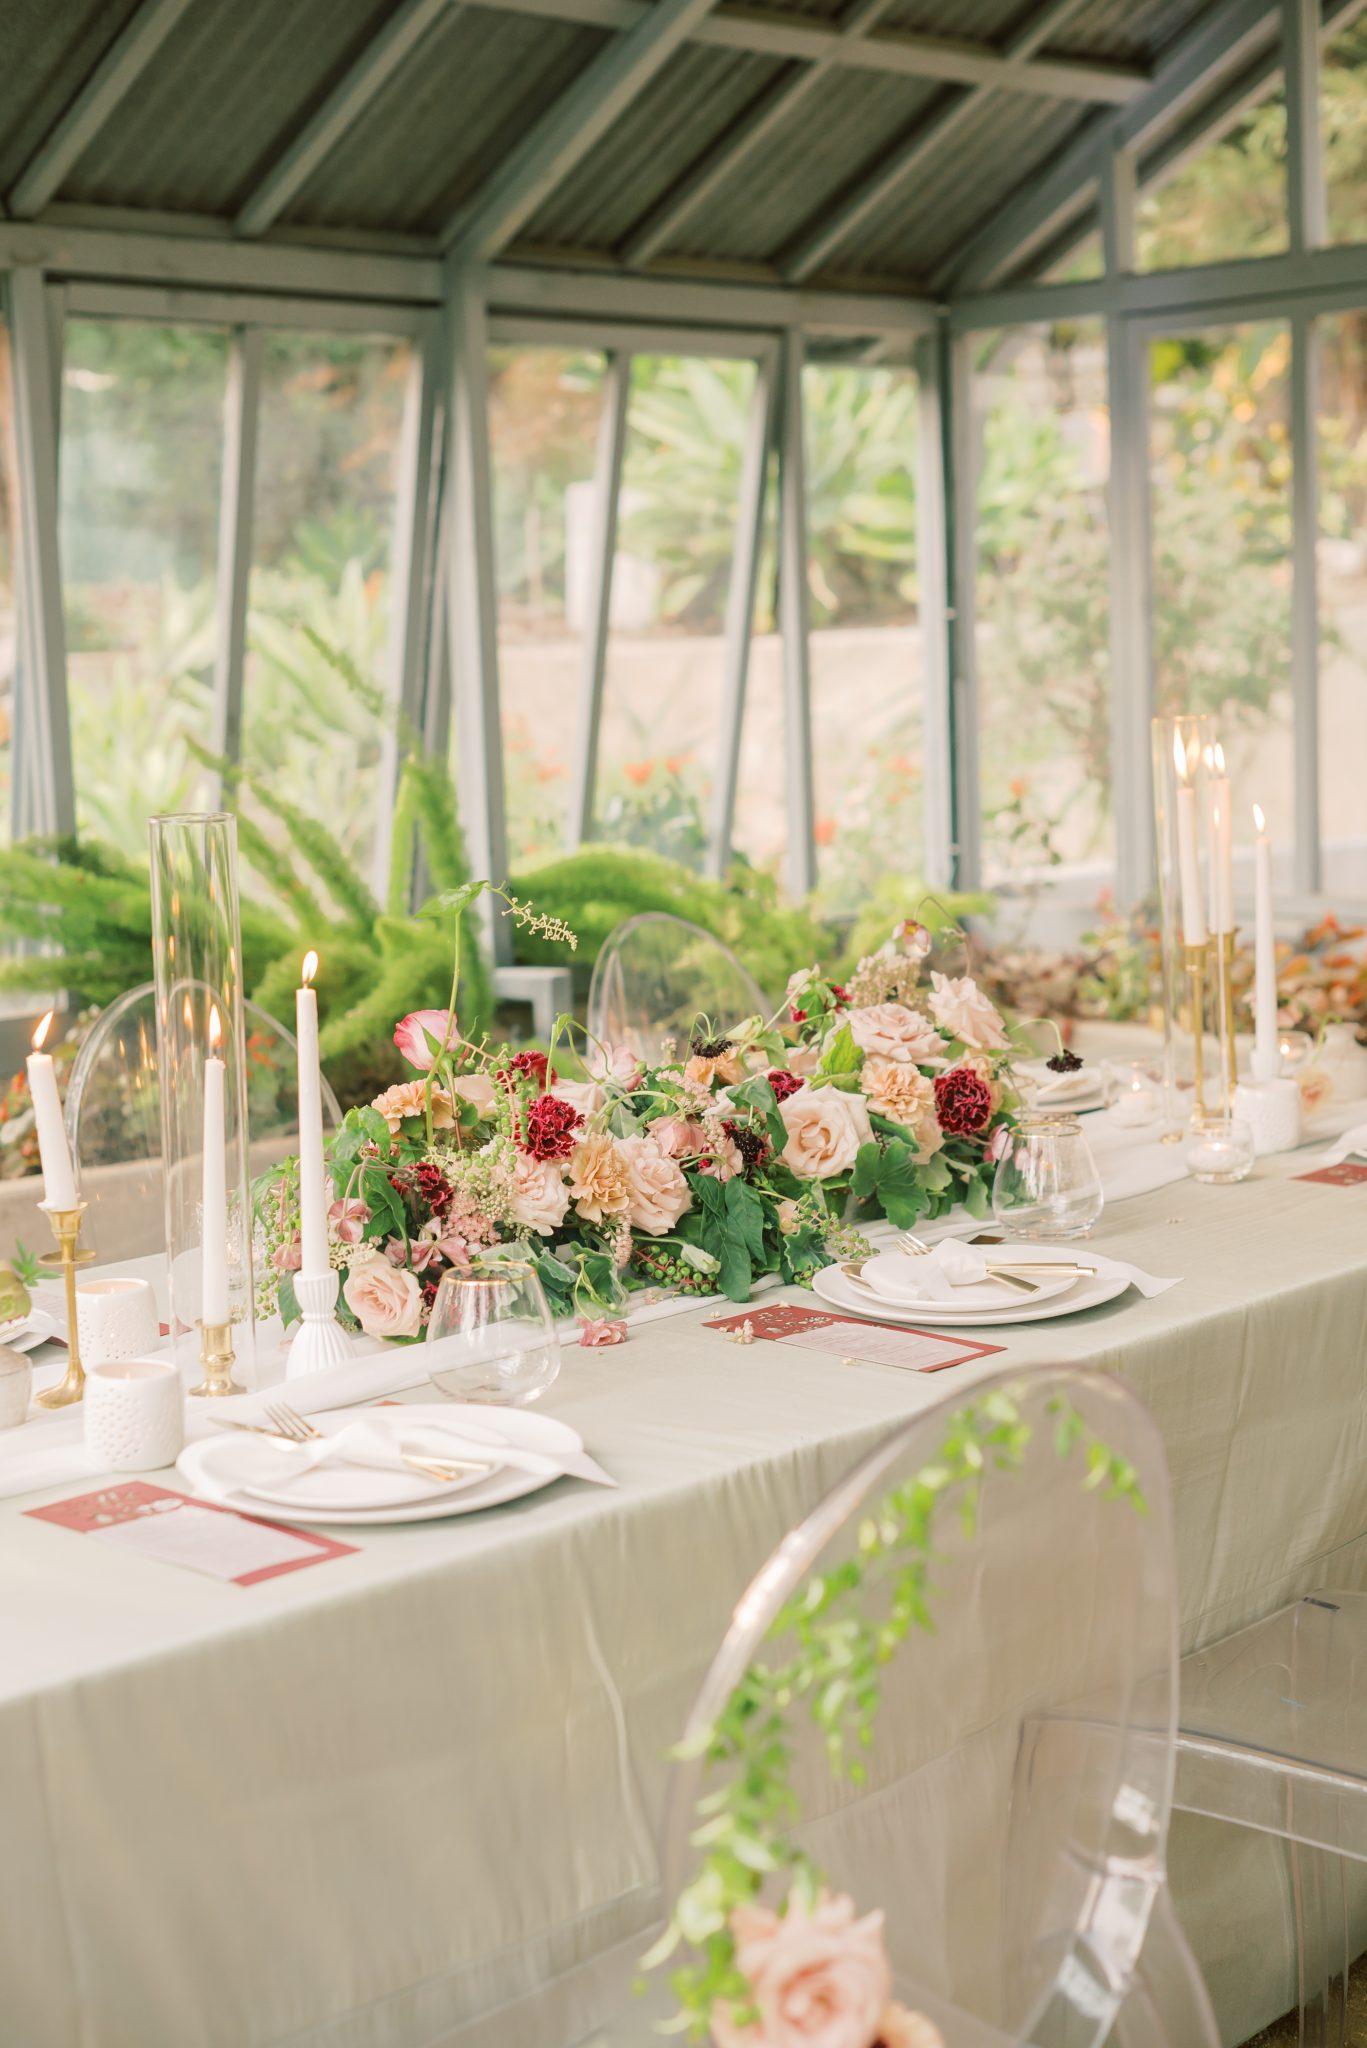 greenhouse wedding_blush rose centerpiece-meadows events